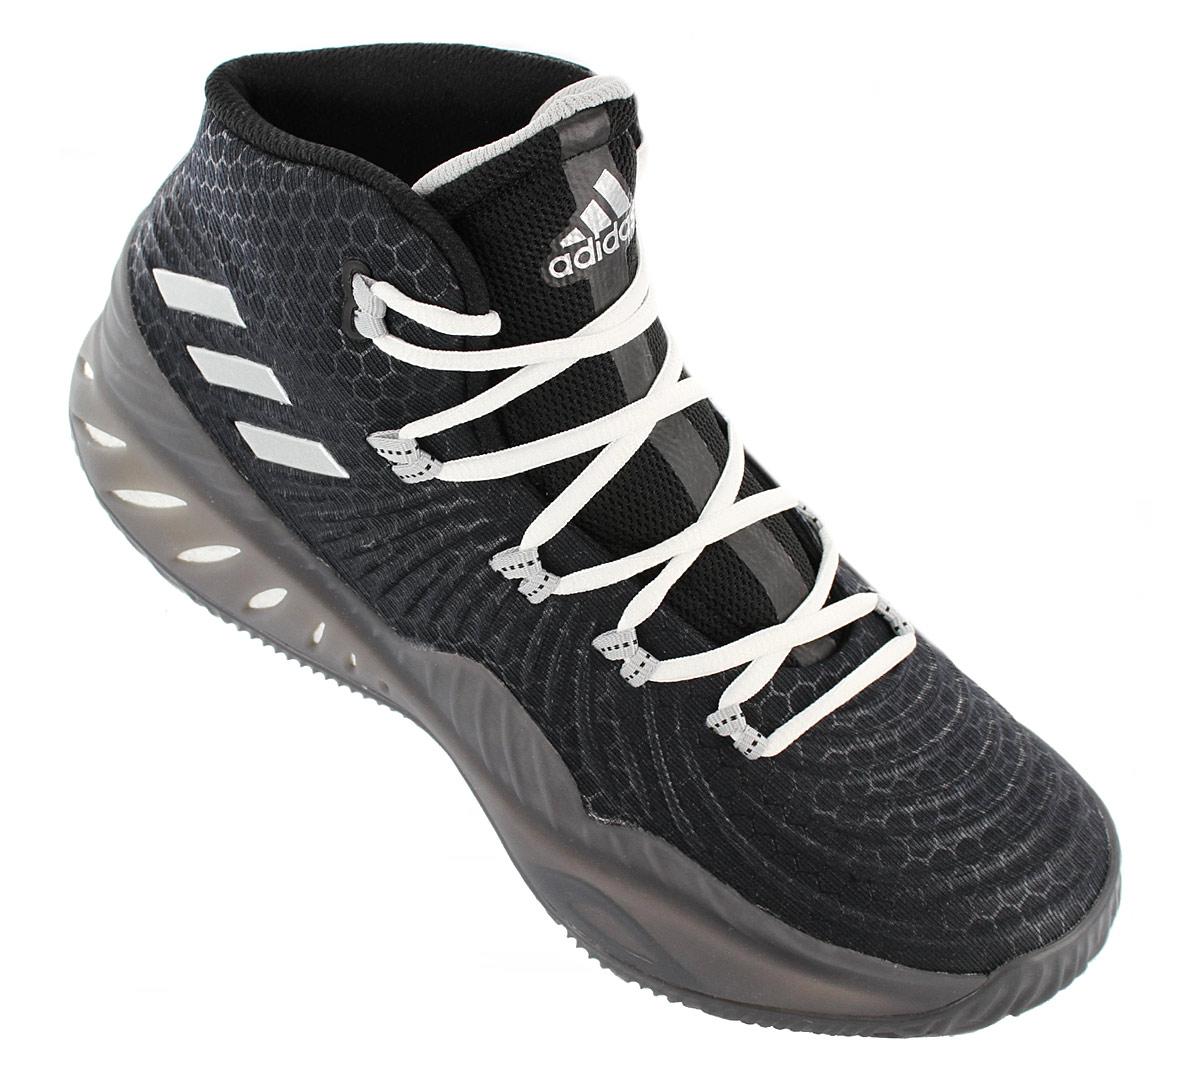 Details zu adidas Crazy Explosive 2017 Boost Herren Basketballschuhe Schuhe BW0985 NEU